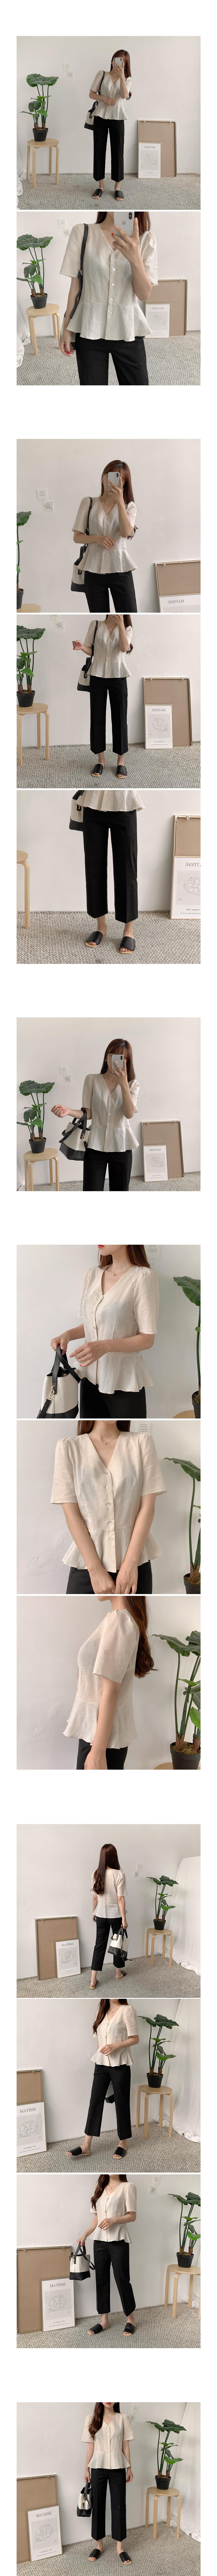 Plotted linen blouse